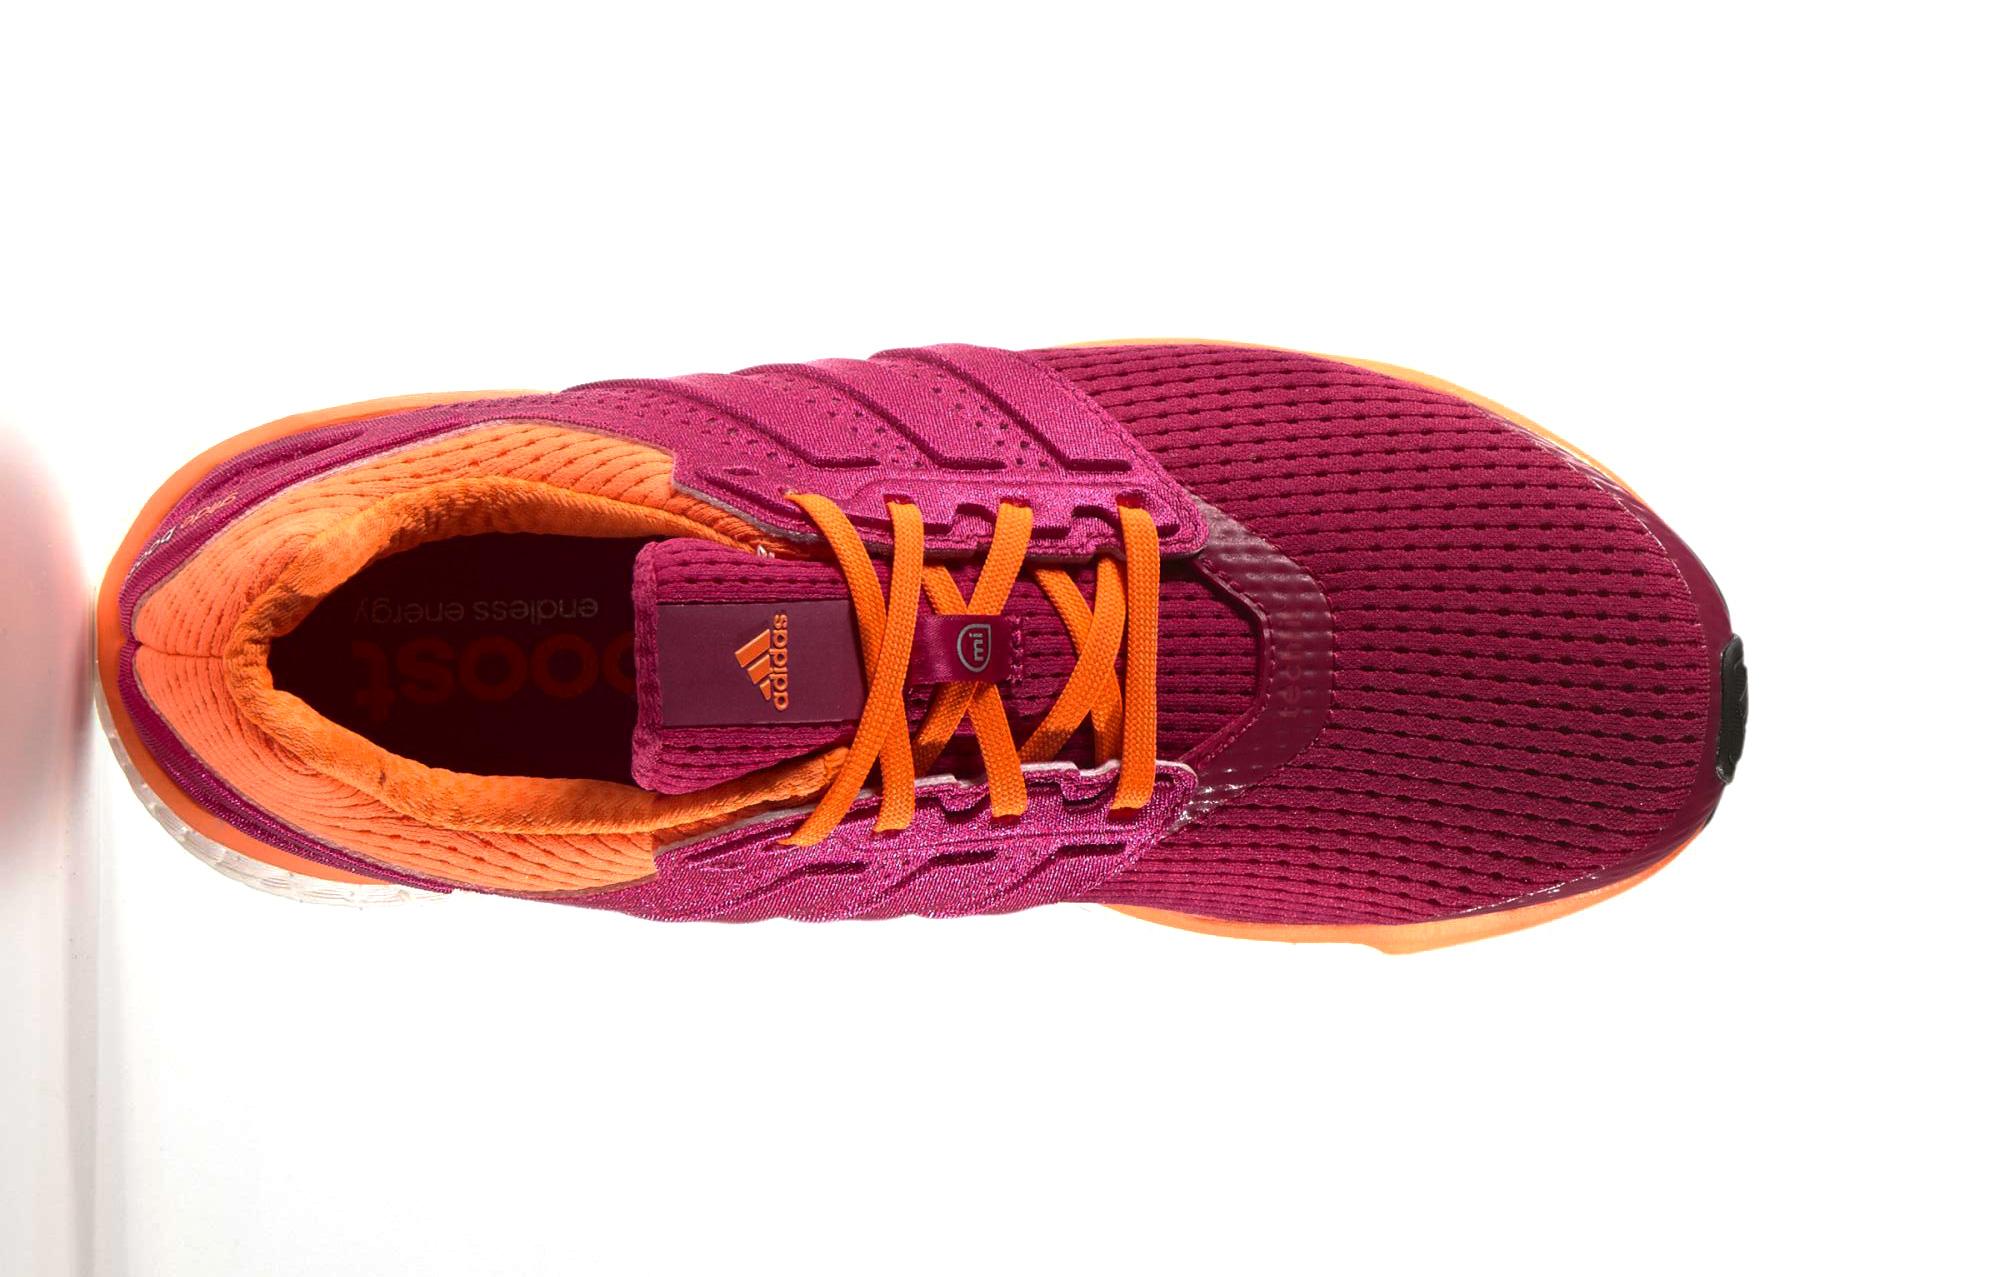 meilleur service ccbe7 dcd4c adidas Supernova Glide Boost 7 Womens Running Shoes - Pink Orange